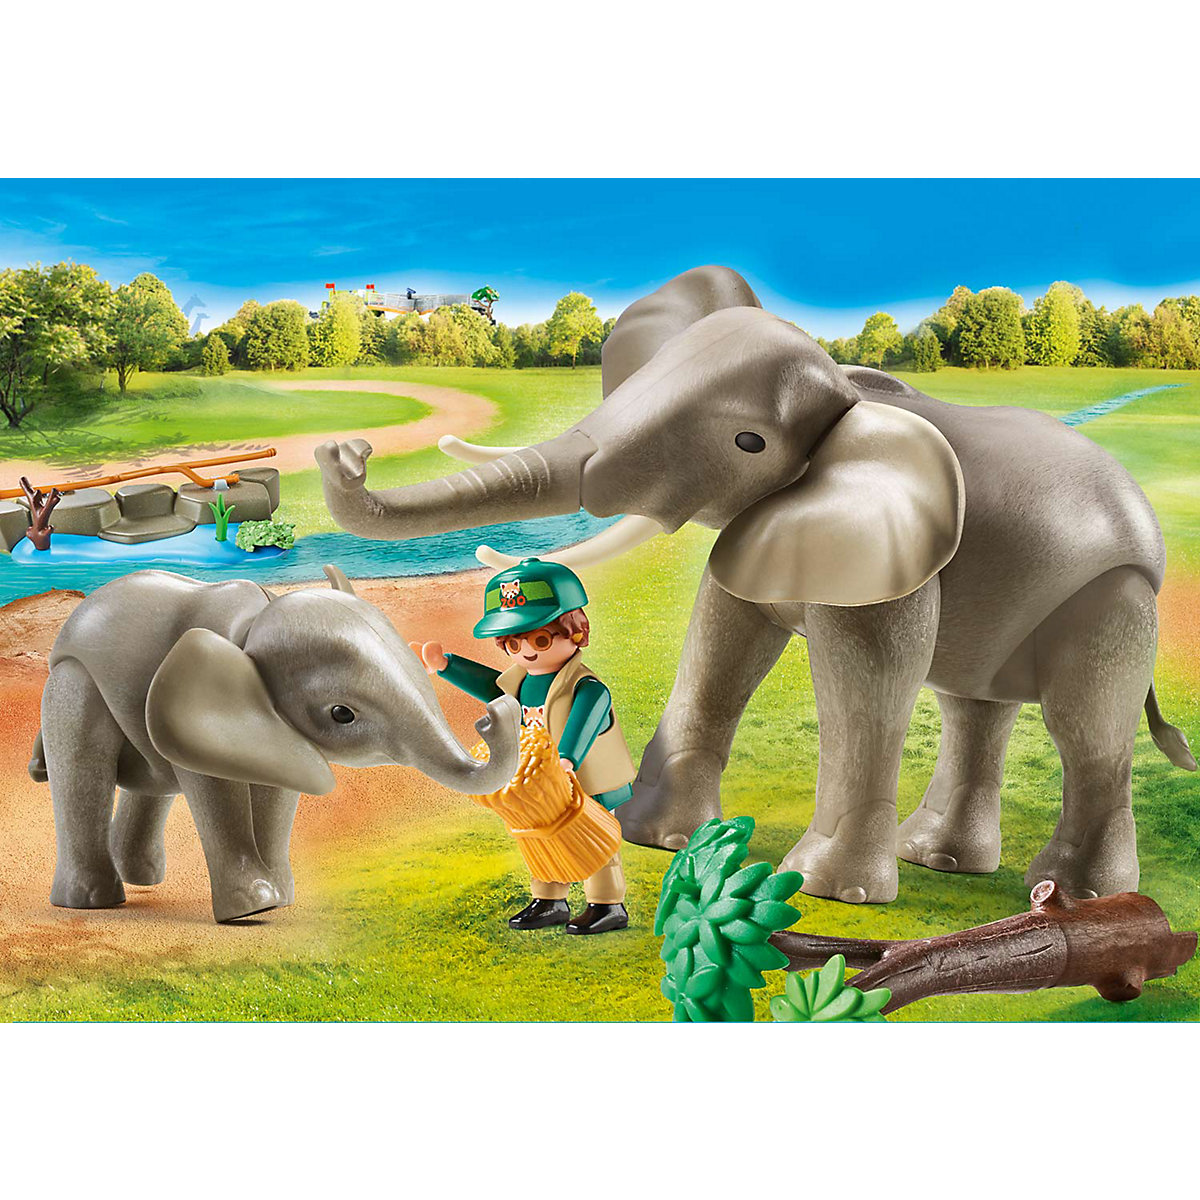 PLAYMOBIL® 70324 Elefanten im Freigehege PLAYMOBIL Family Fun G9o1B